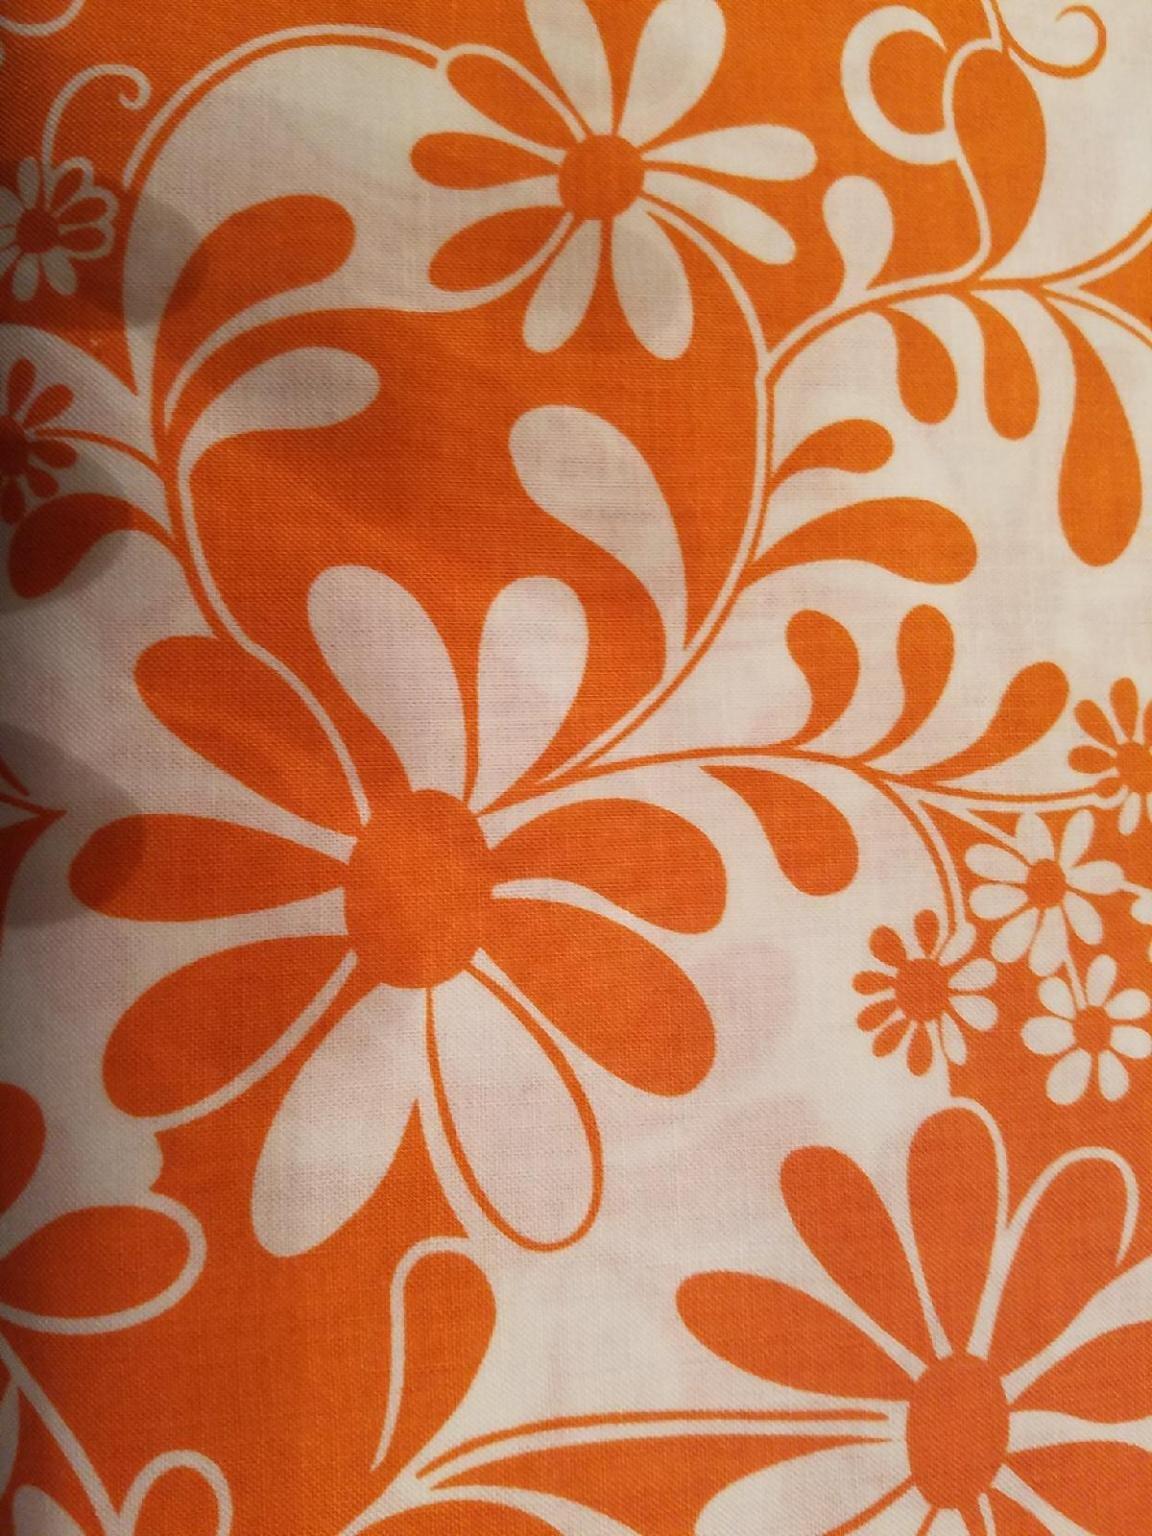 Benartex Crazy Daisy Orange white Floral